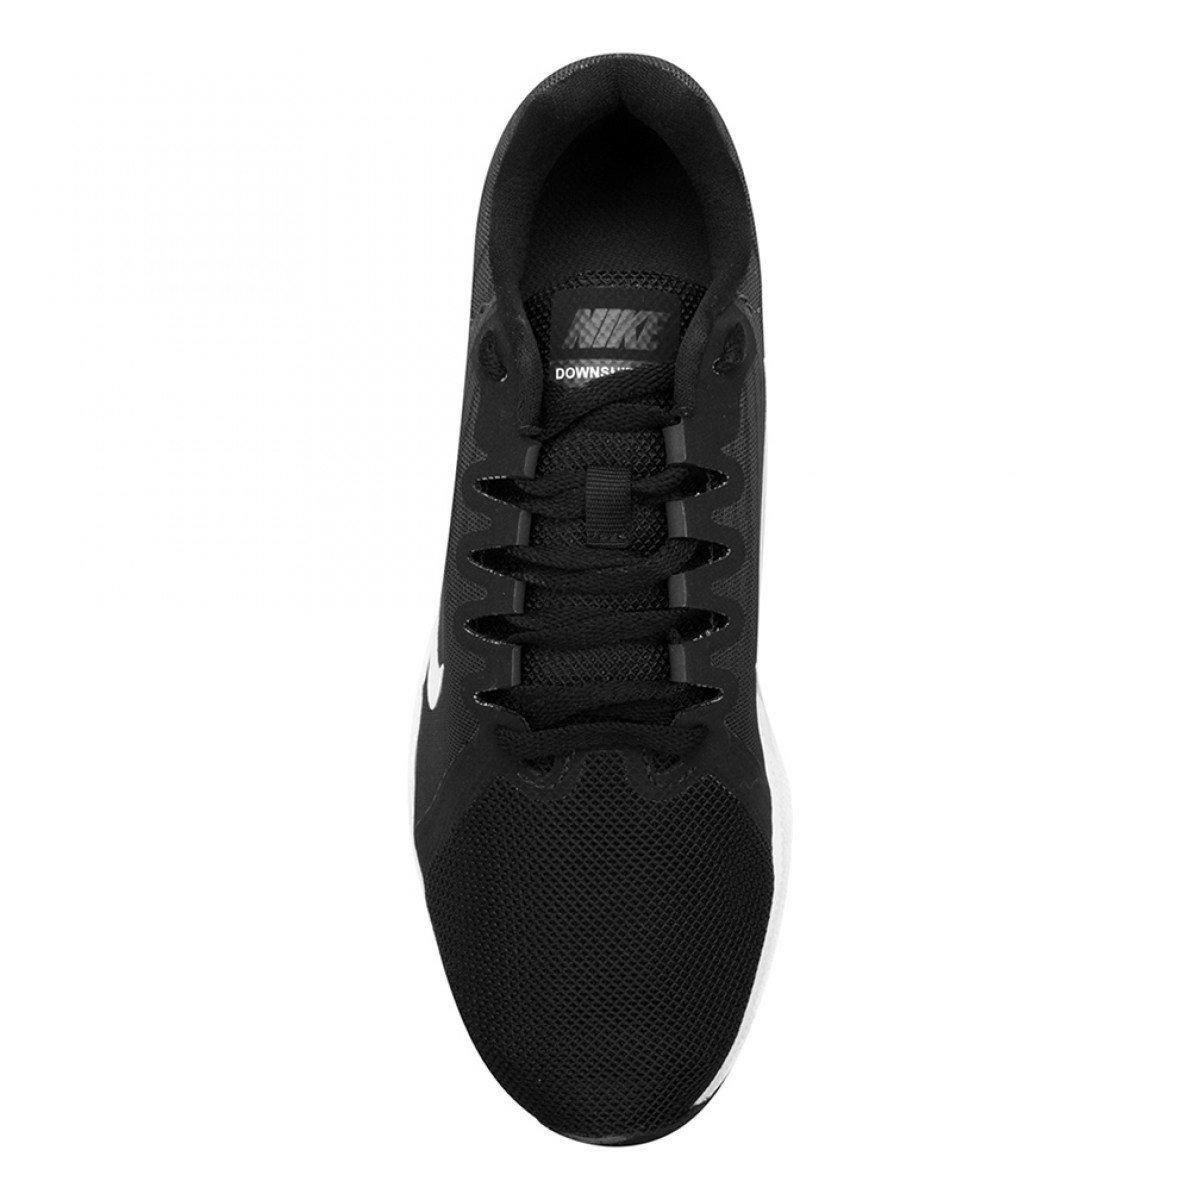 011e6b19c8 Tênis Nike Wmns Downshifter 8 Feminino Preto e Branco - Compre Agora ...